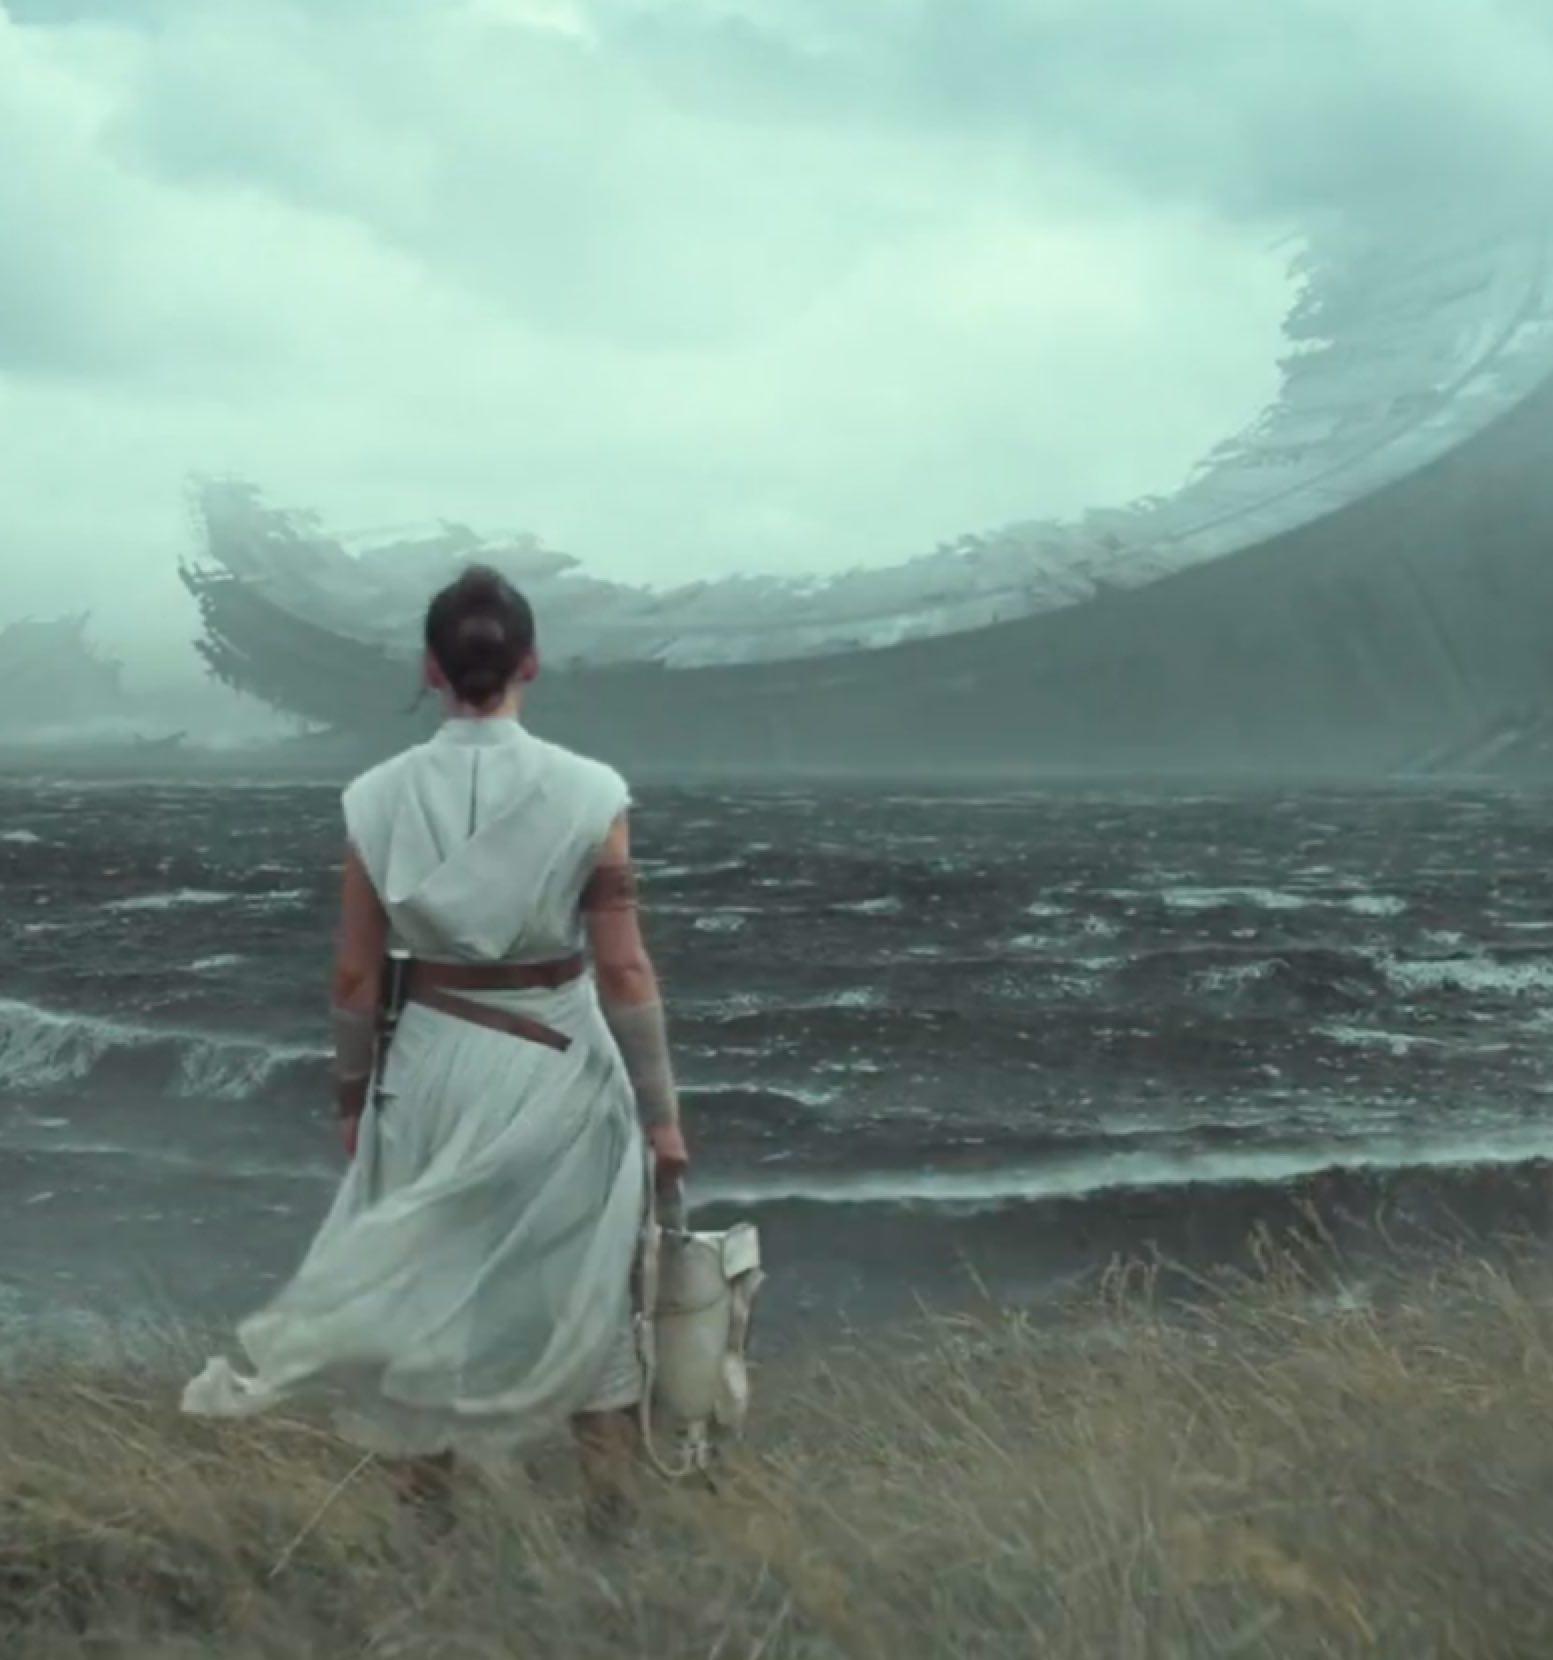 Star Wars The Rise of Skywalker deathstar 20 Reasons Why Star Wars: The Rise Of Skywalker Makes Absolutely No Sense